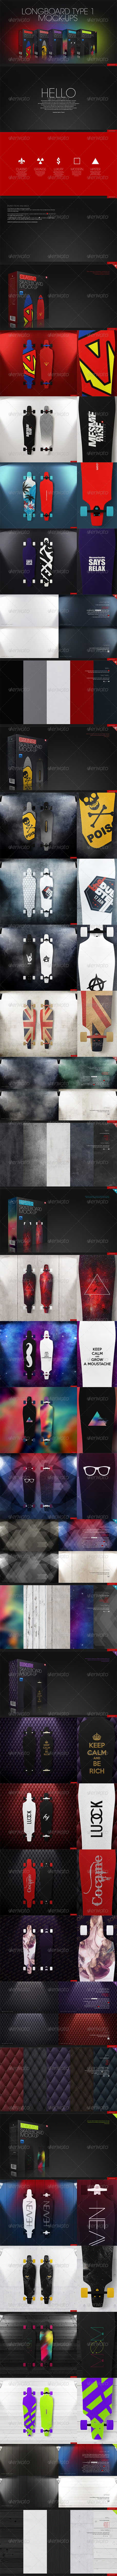 GraphicRiver Downhill Longboard Skateboard 5 Scenes Mock-up 7808102